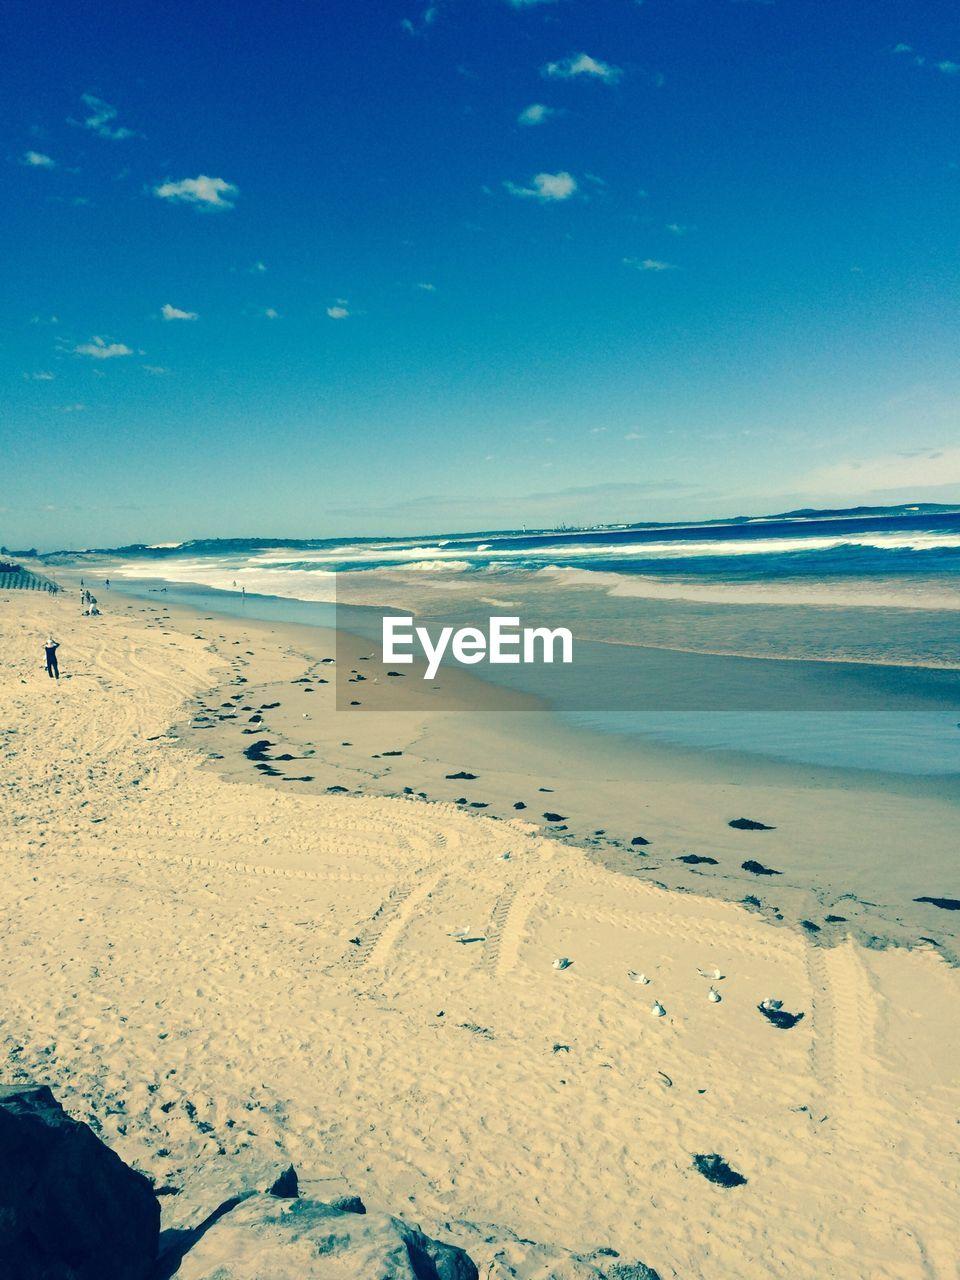 Sandy coastline on clear day